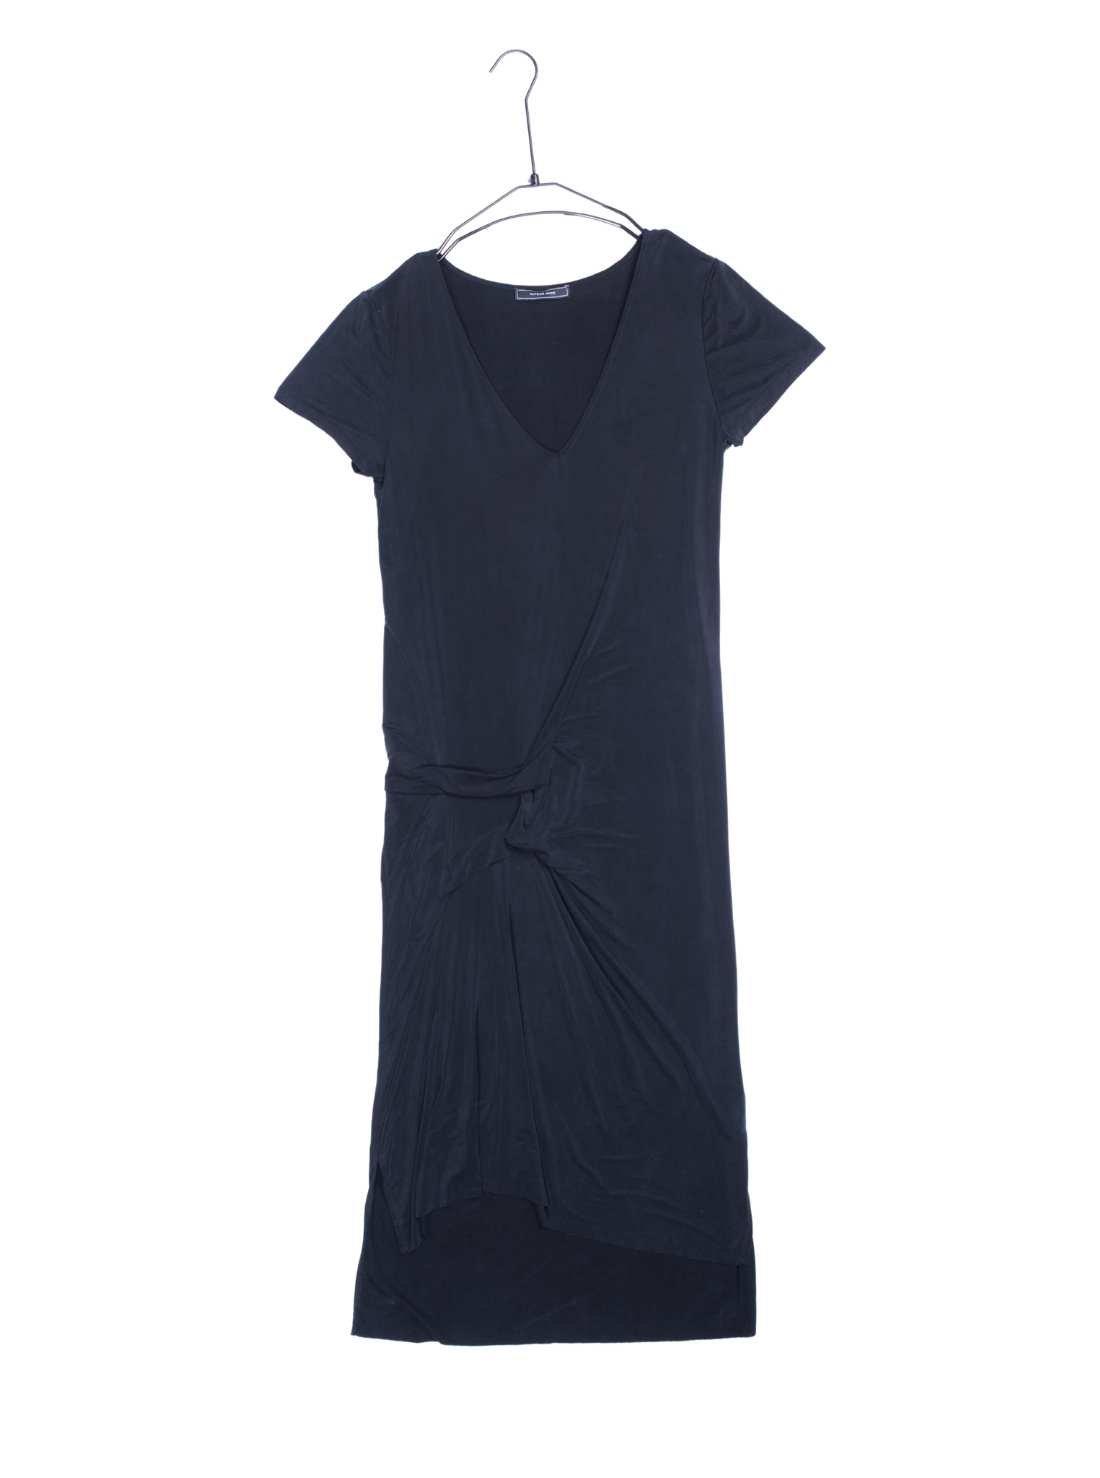 Short Sleeves V-Neck Cupro Jersey Dress